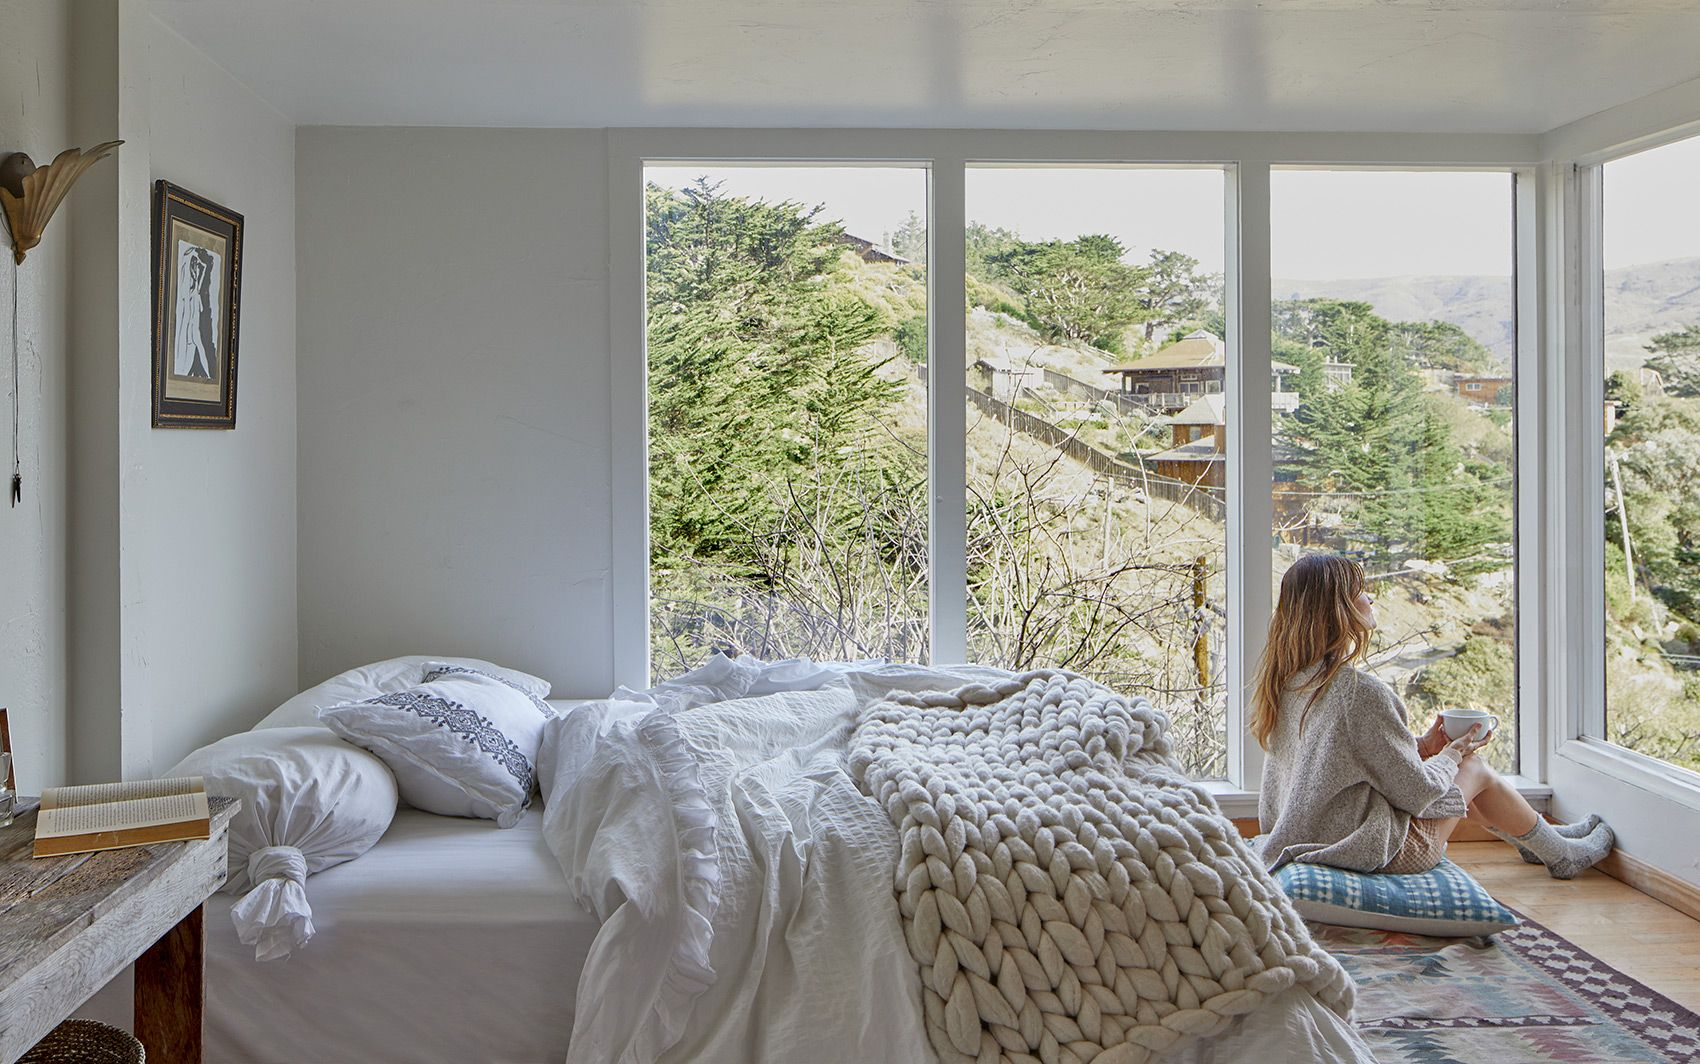 Bedroom_Ciana_Marin_County_15467Finb.jpg